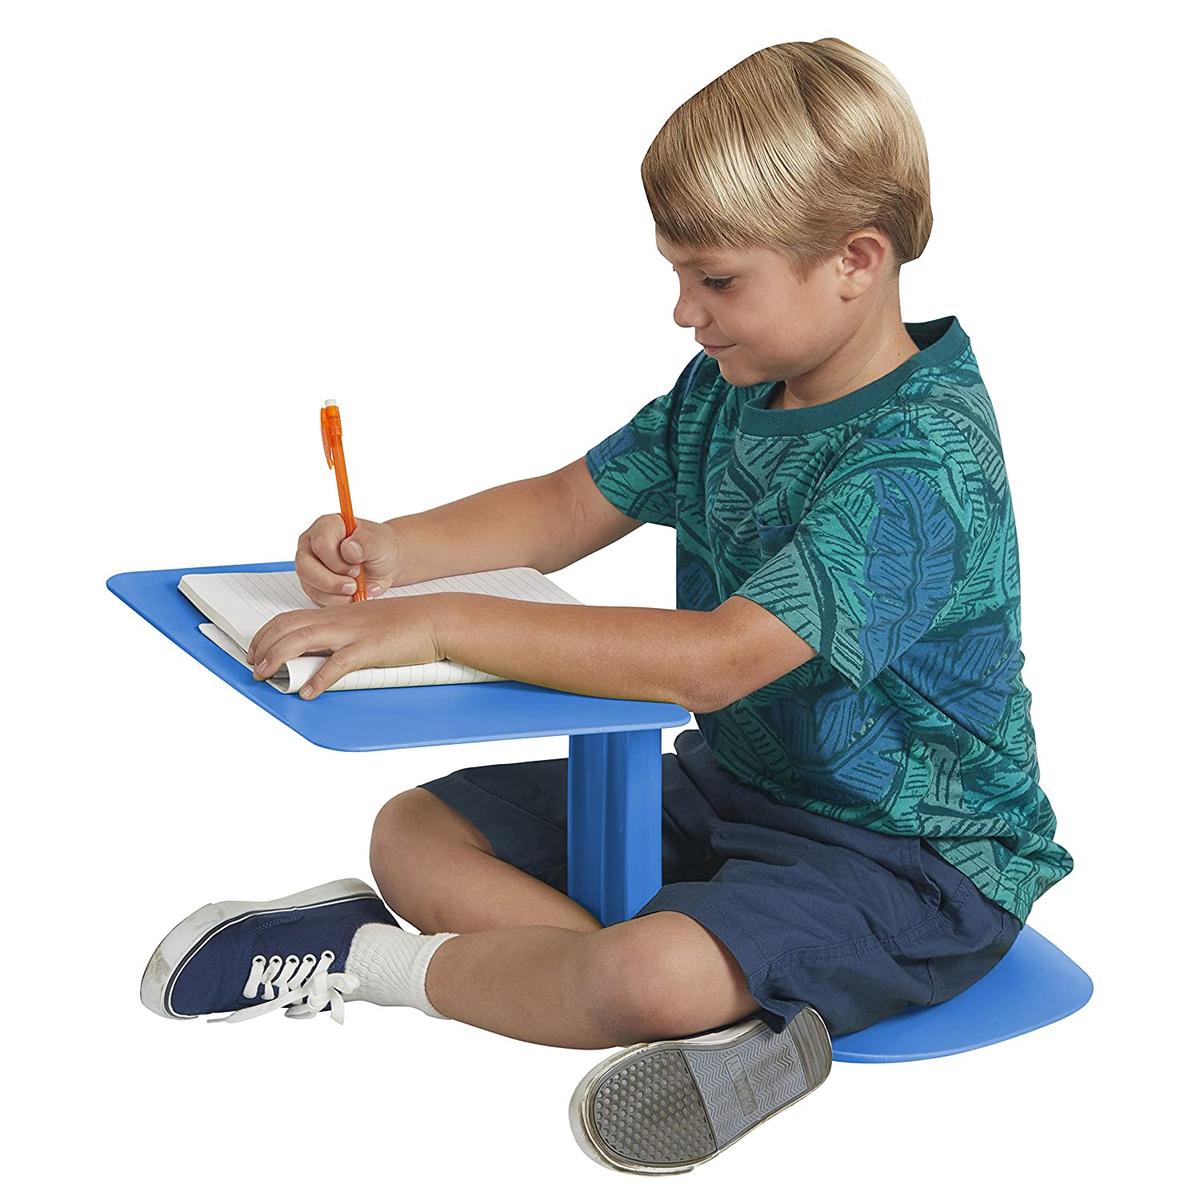 The Surf Portable Lap Desk  Only $28.49!!  2